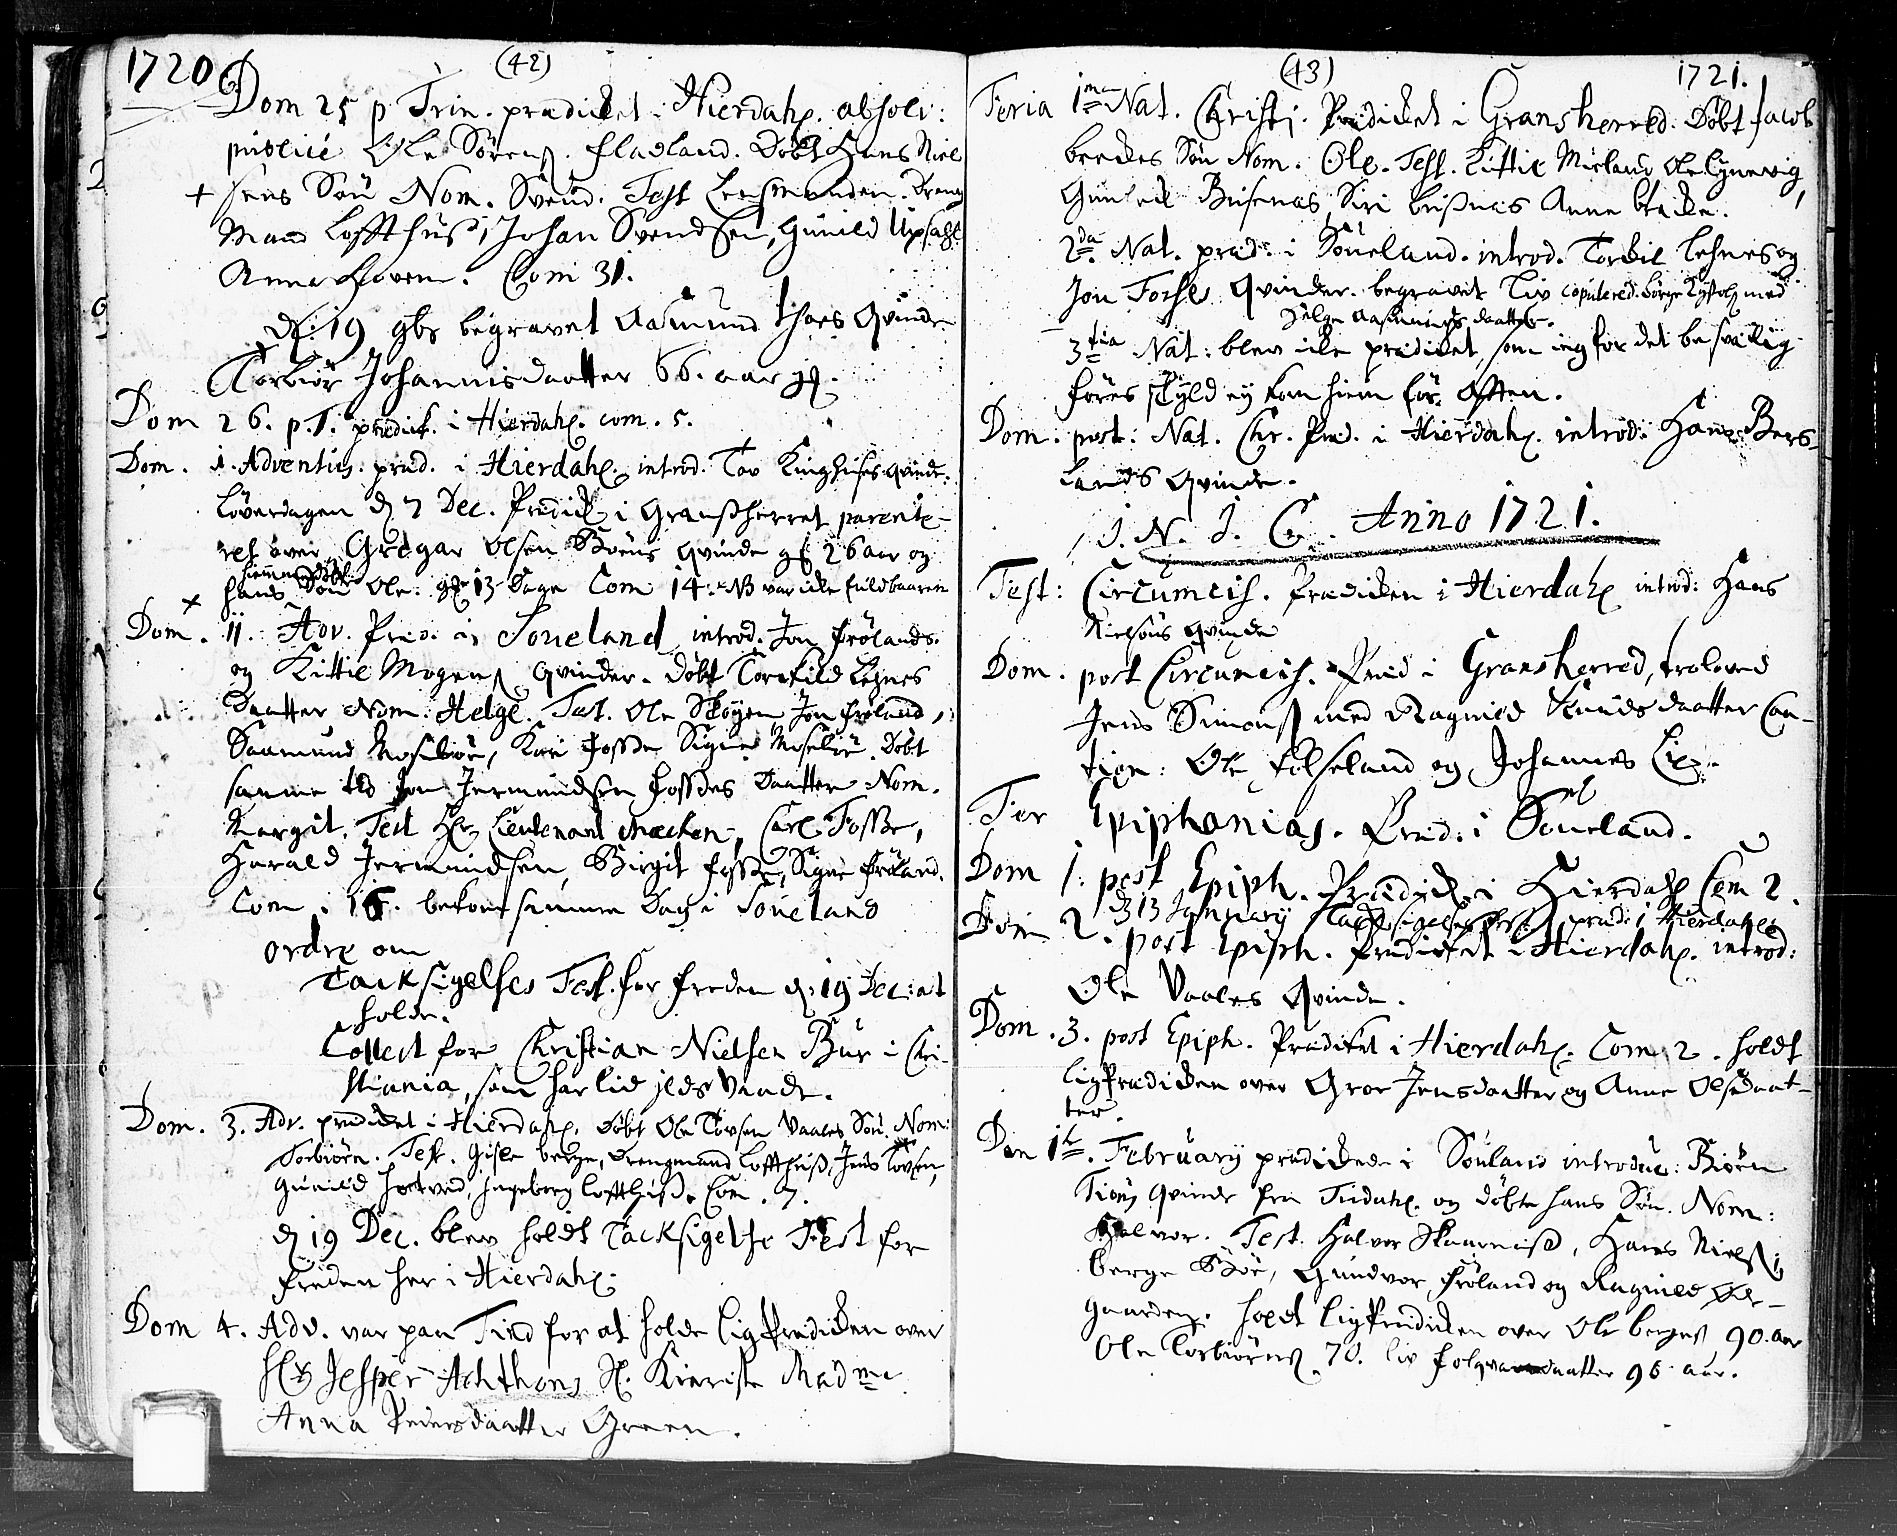 SAKO, Hjartdal kirkebøker, F/Fa/L0002: Ministerialbok nr. I 2, 1716-1754, s. 42-43